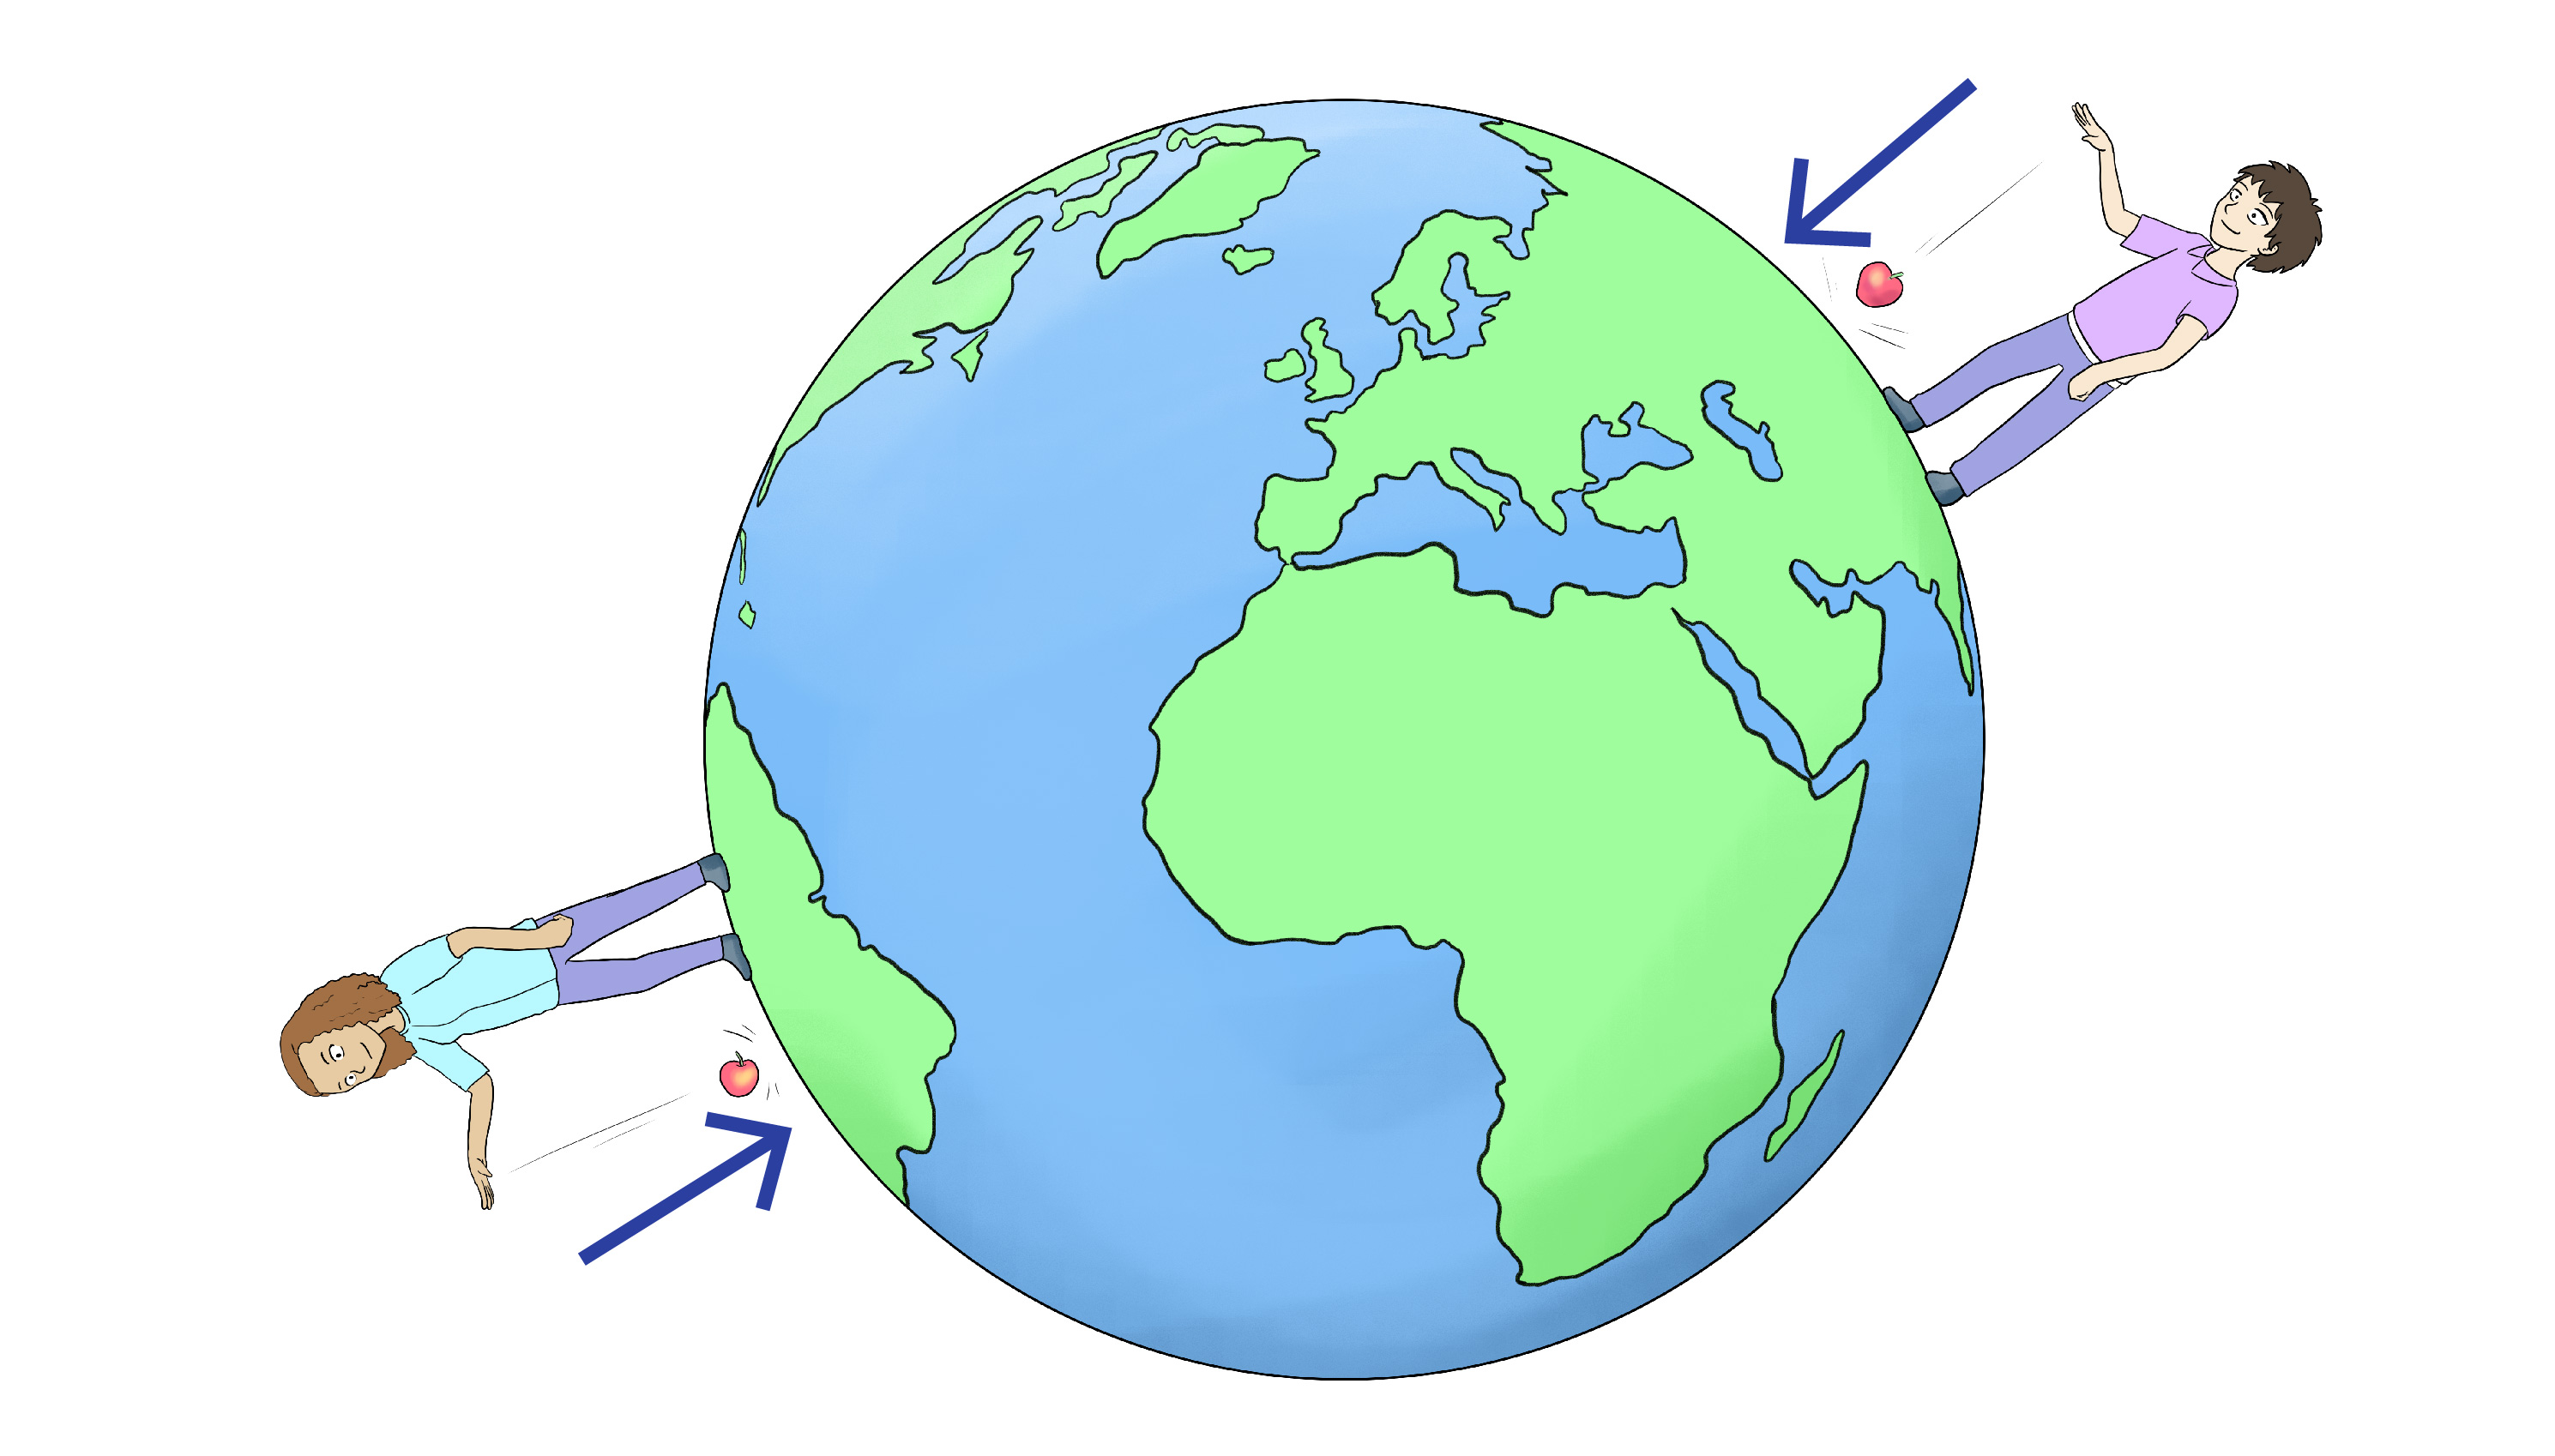 why we don'tfalloff earth සඳහා පින්තුර ප්රතිඵල